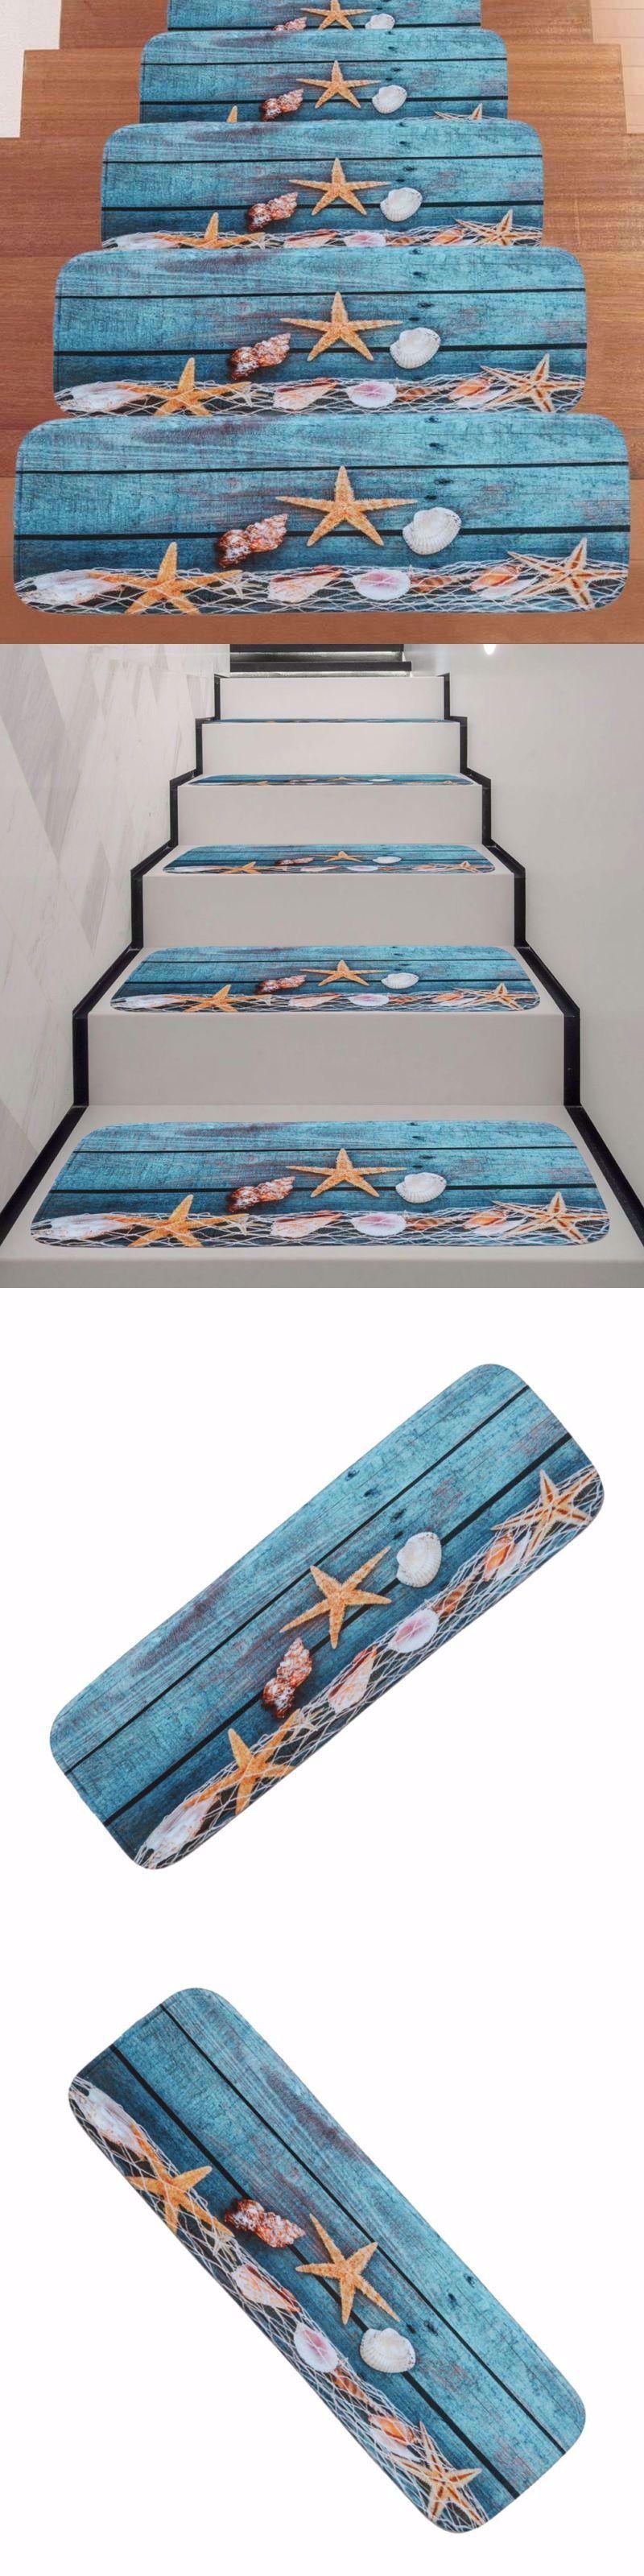 Best Stair Treads Non Slip Carpets In 2020 Carpet Stair 640 x 480